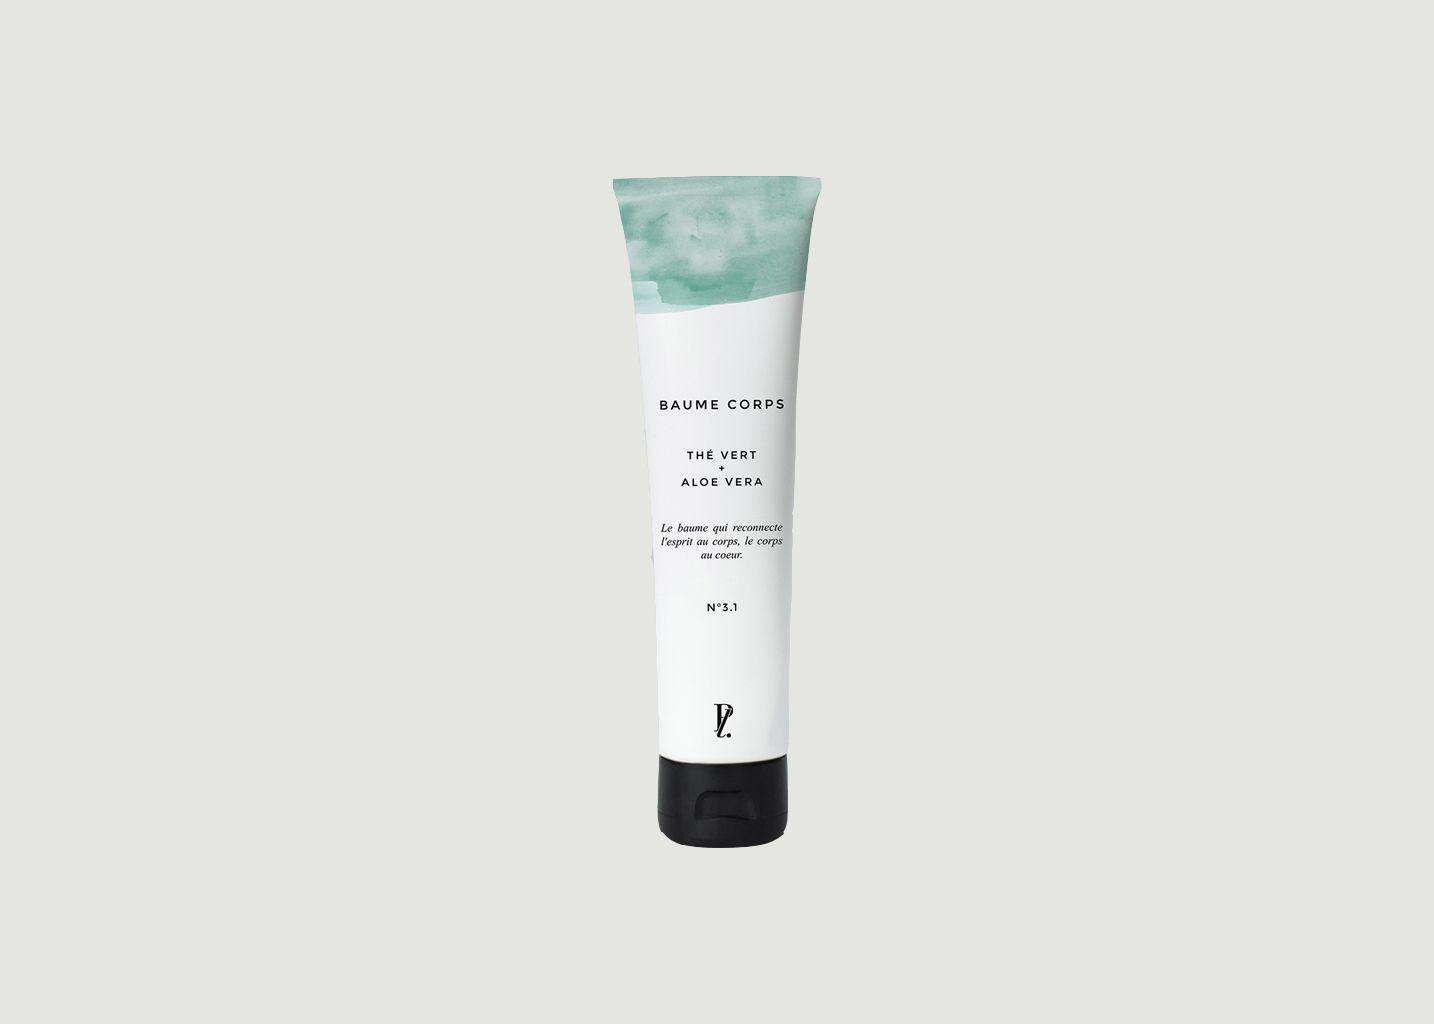 Baume Corps Thé Vert + Aloe Vera - Prescription Lab